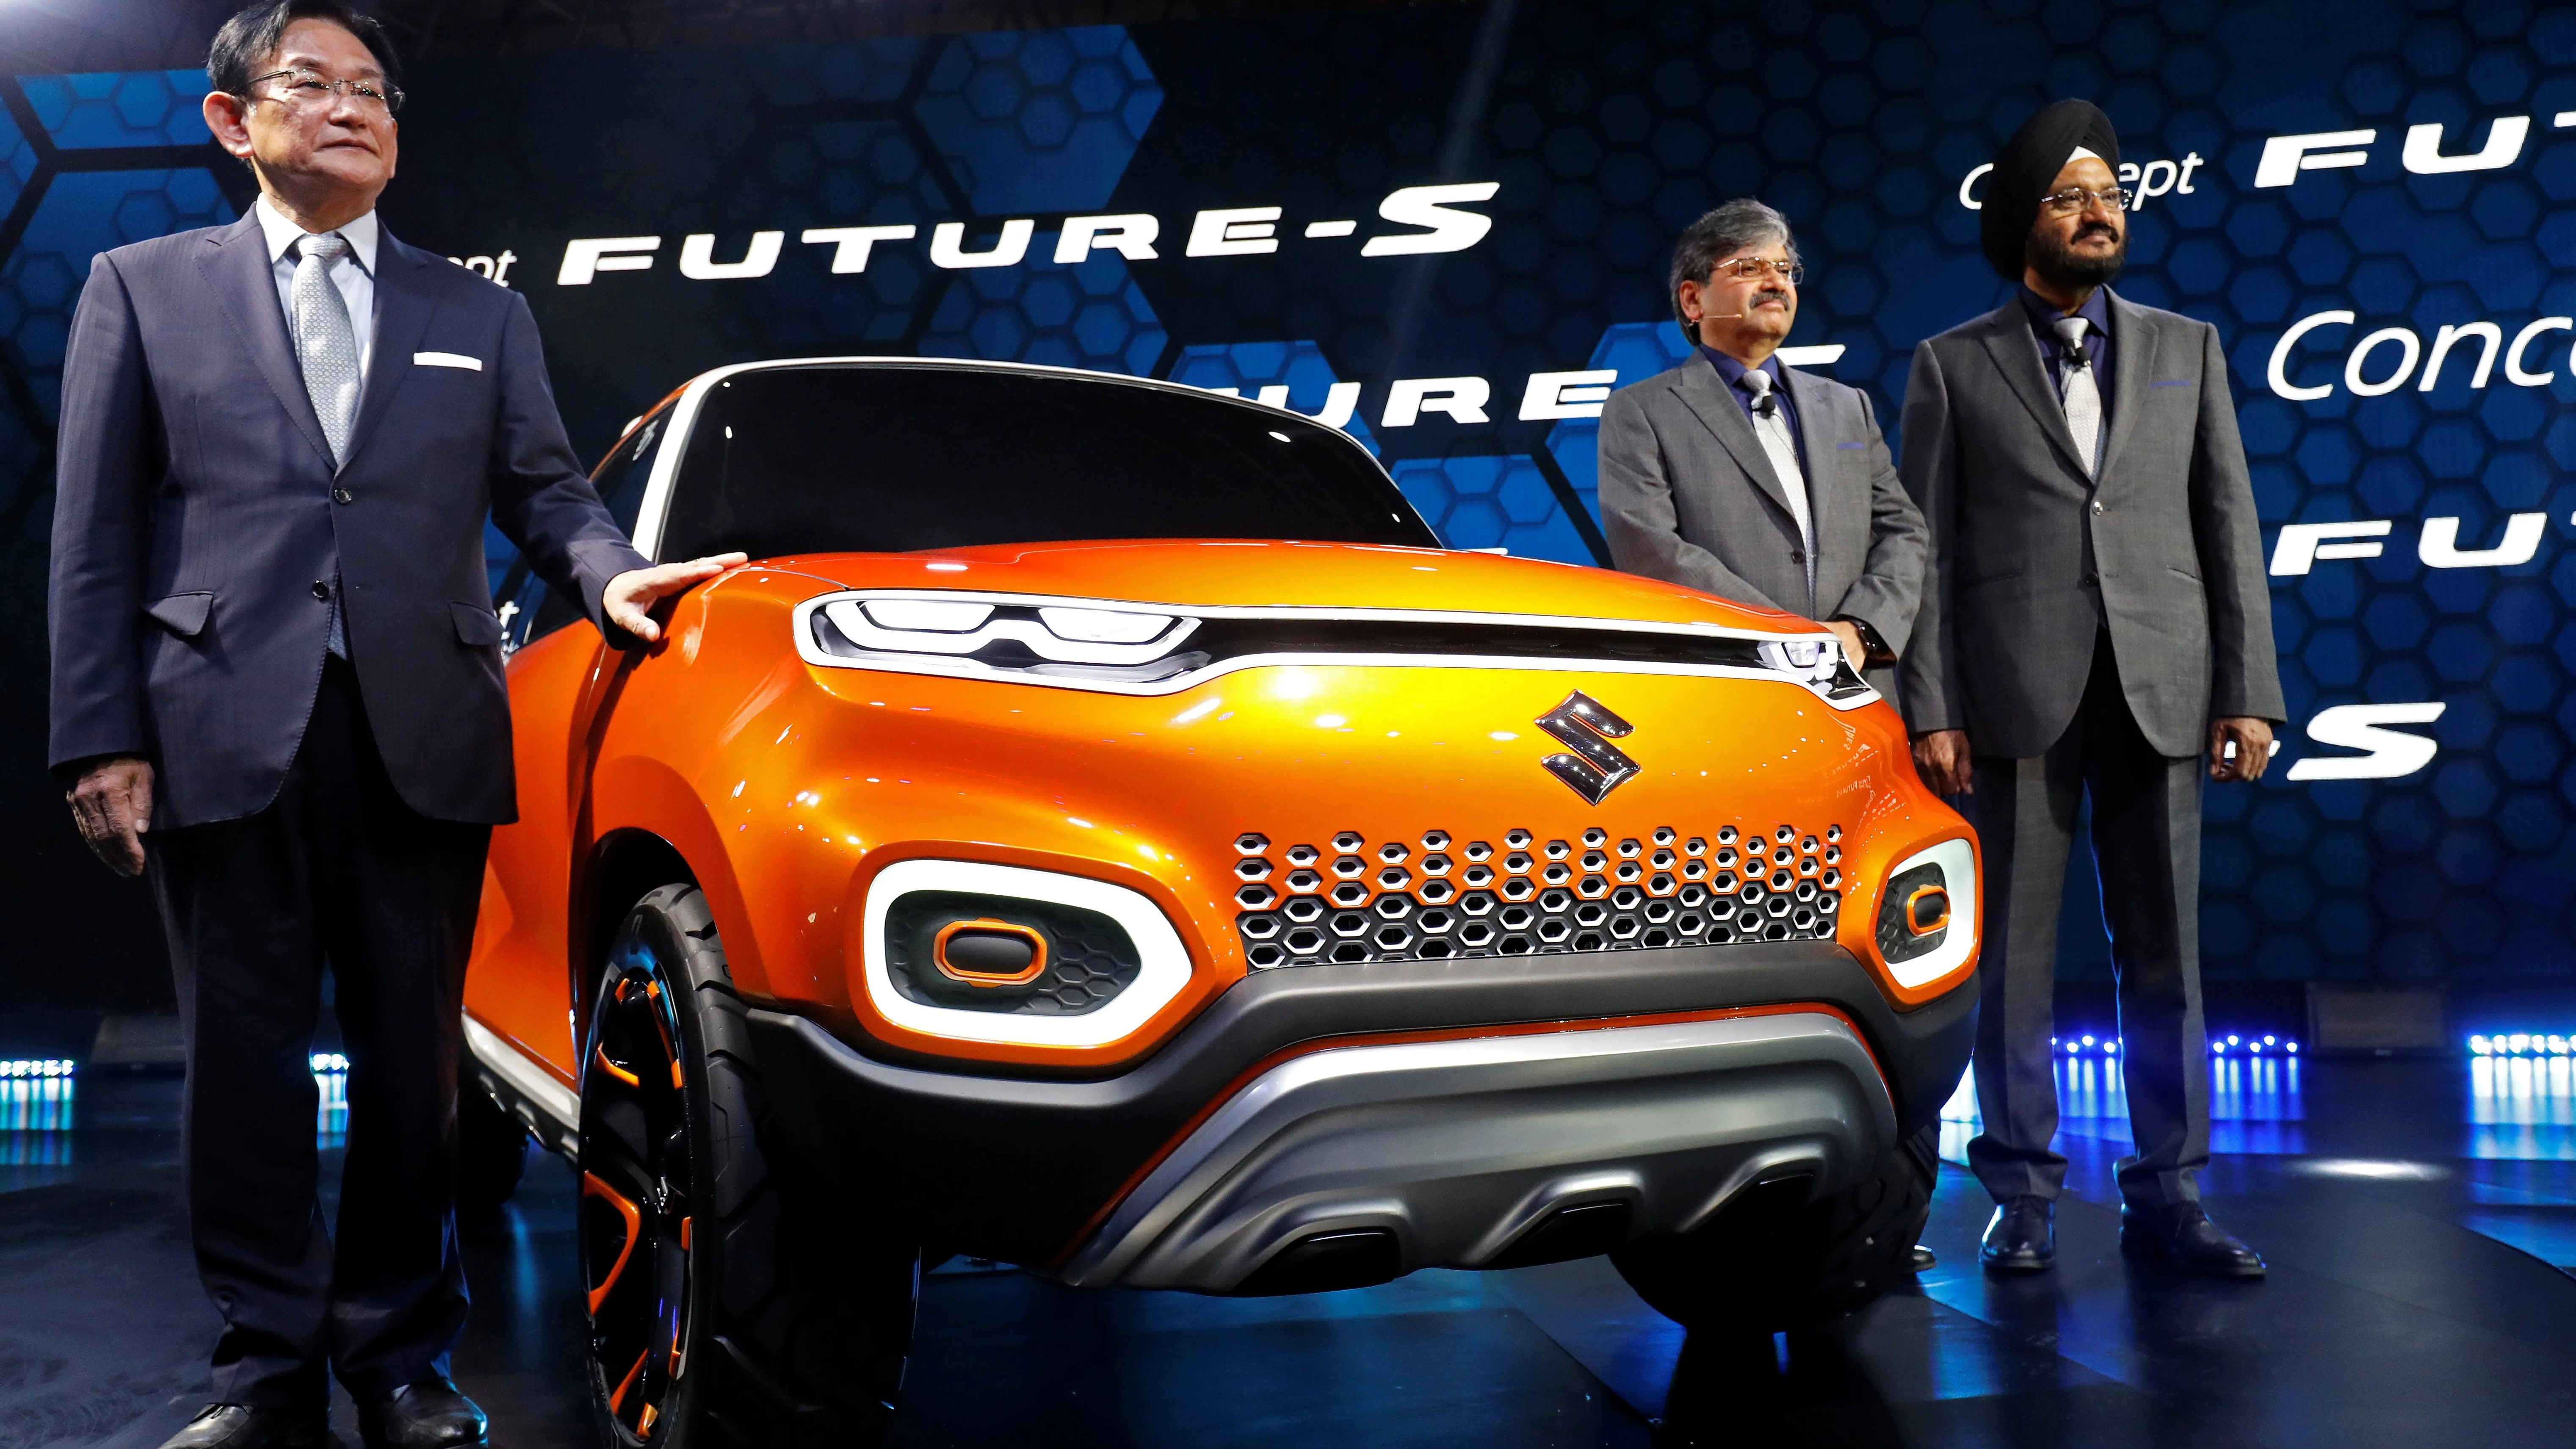 Maruti Suzuki Hero Motocorp Shares Slump After Tax Proposals In